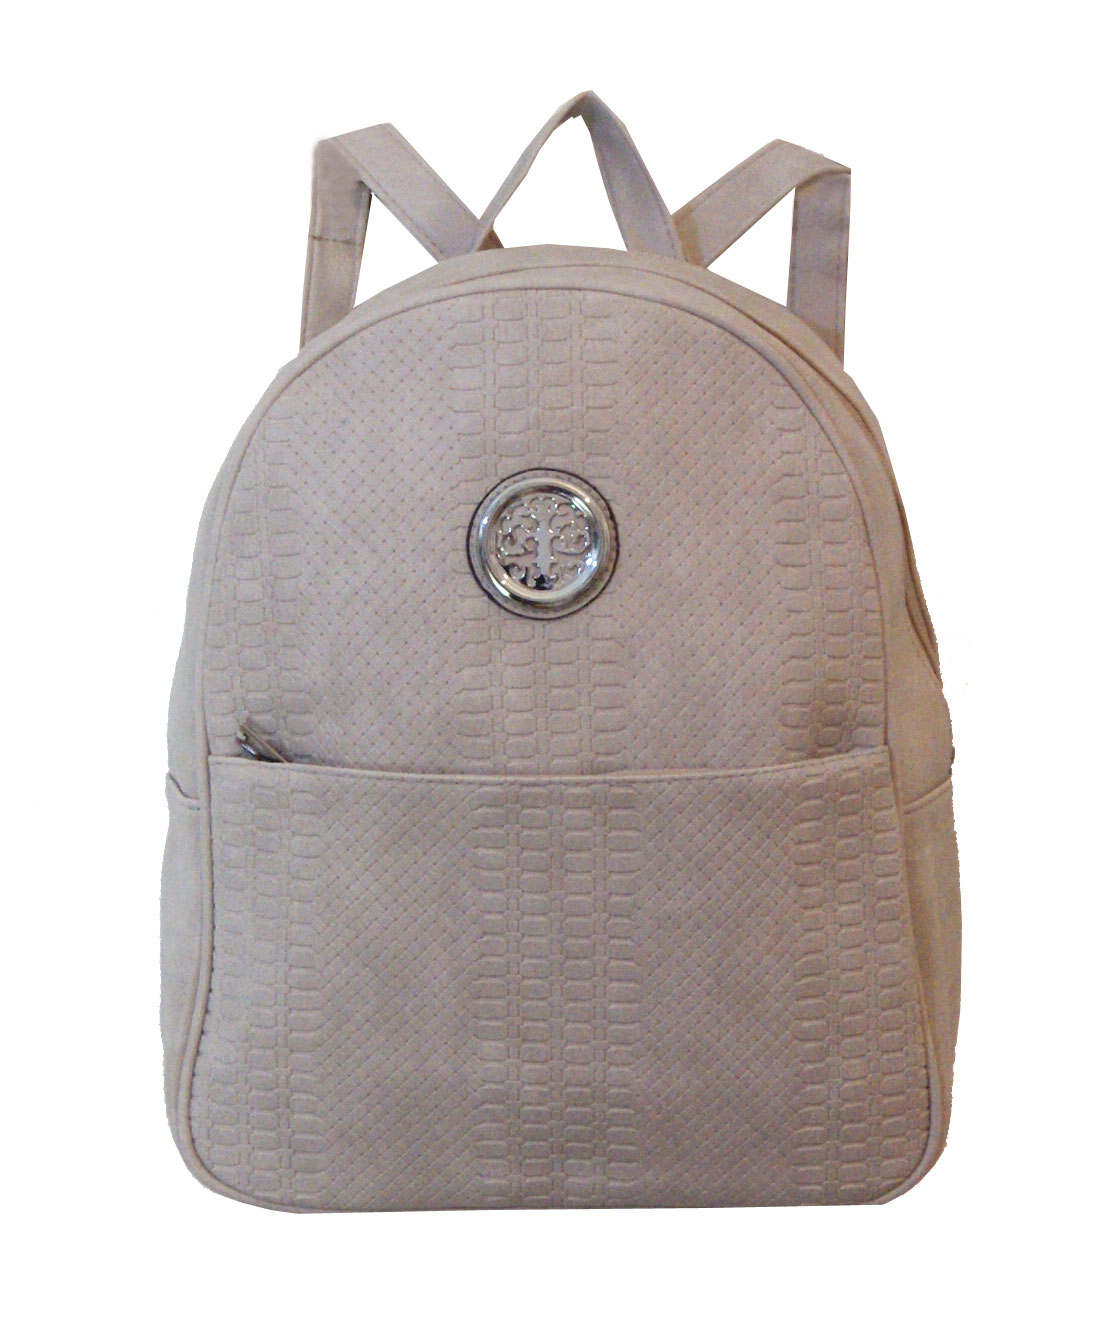 Backpack No 5082 - Μπεζ (Danblini 5082)